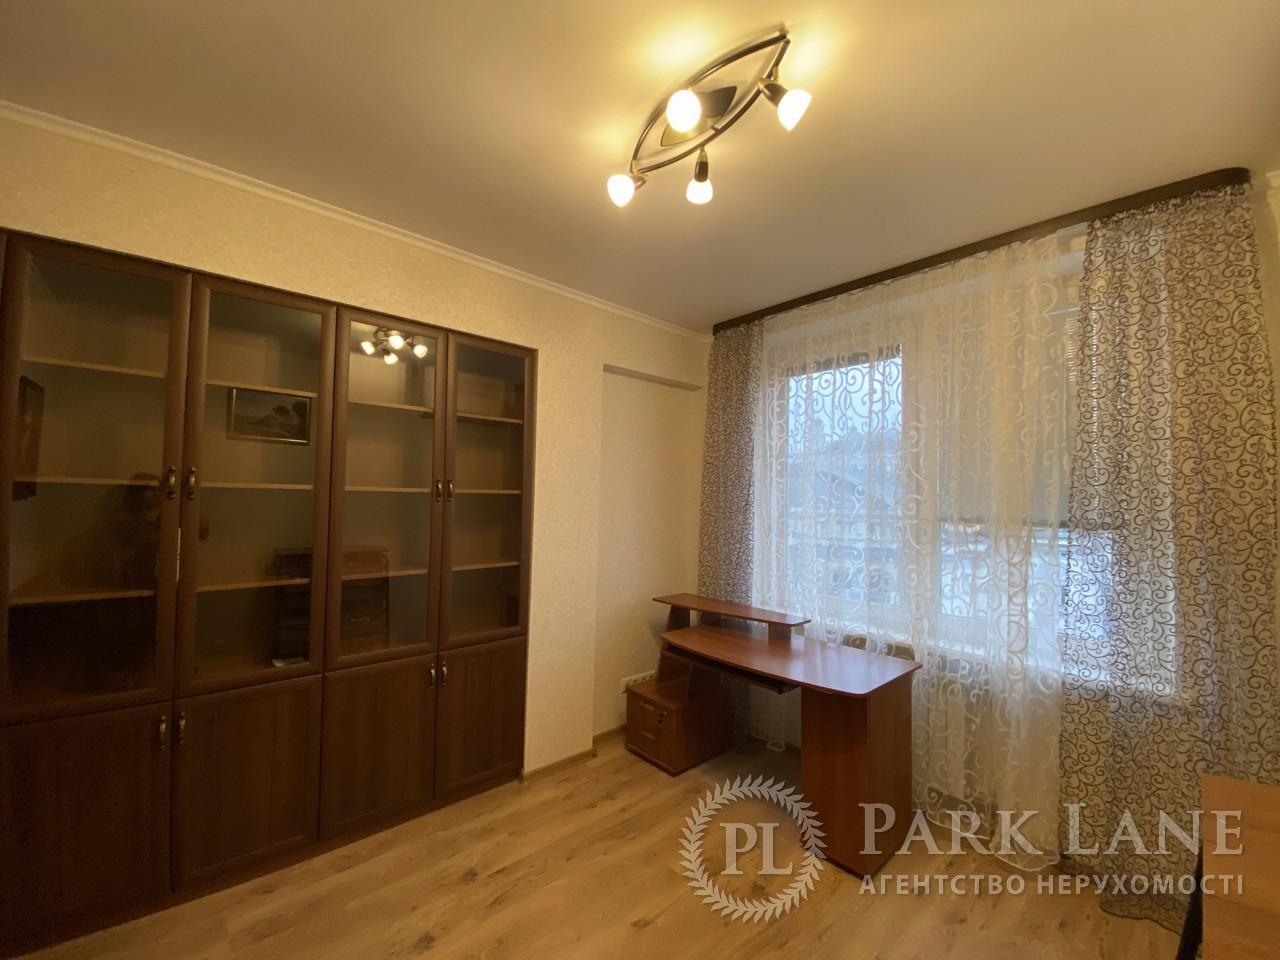 Квартира ул. Владимирская, 51/53, Киев, J-30094 - Фото 11